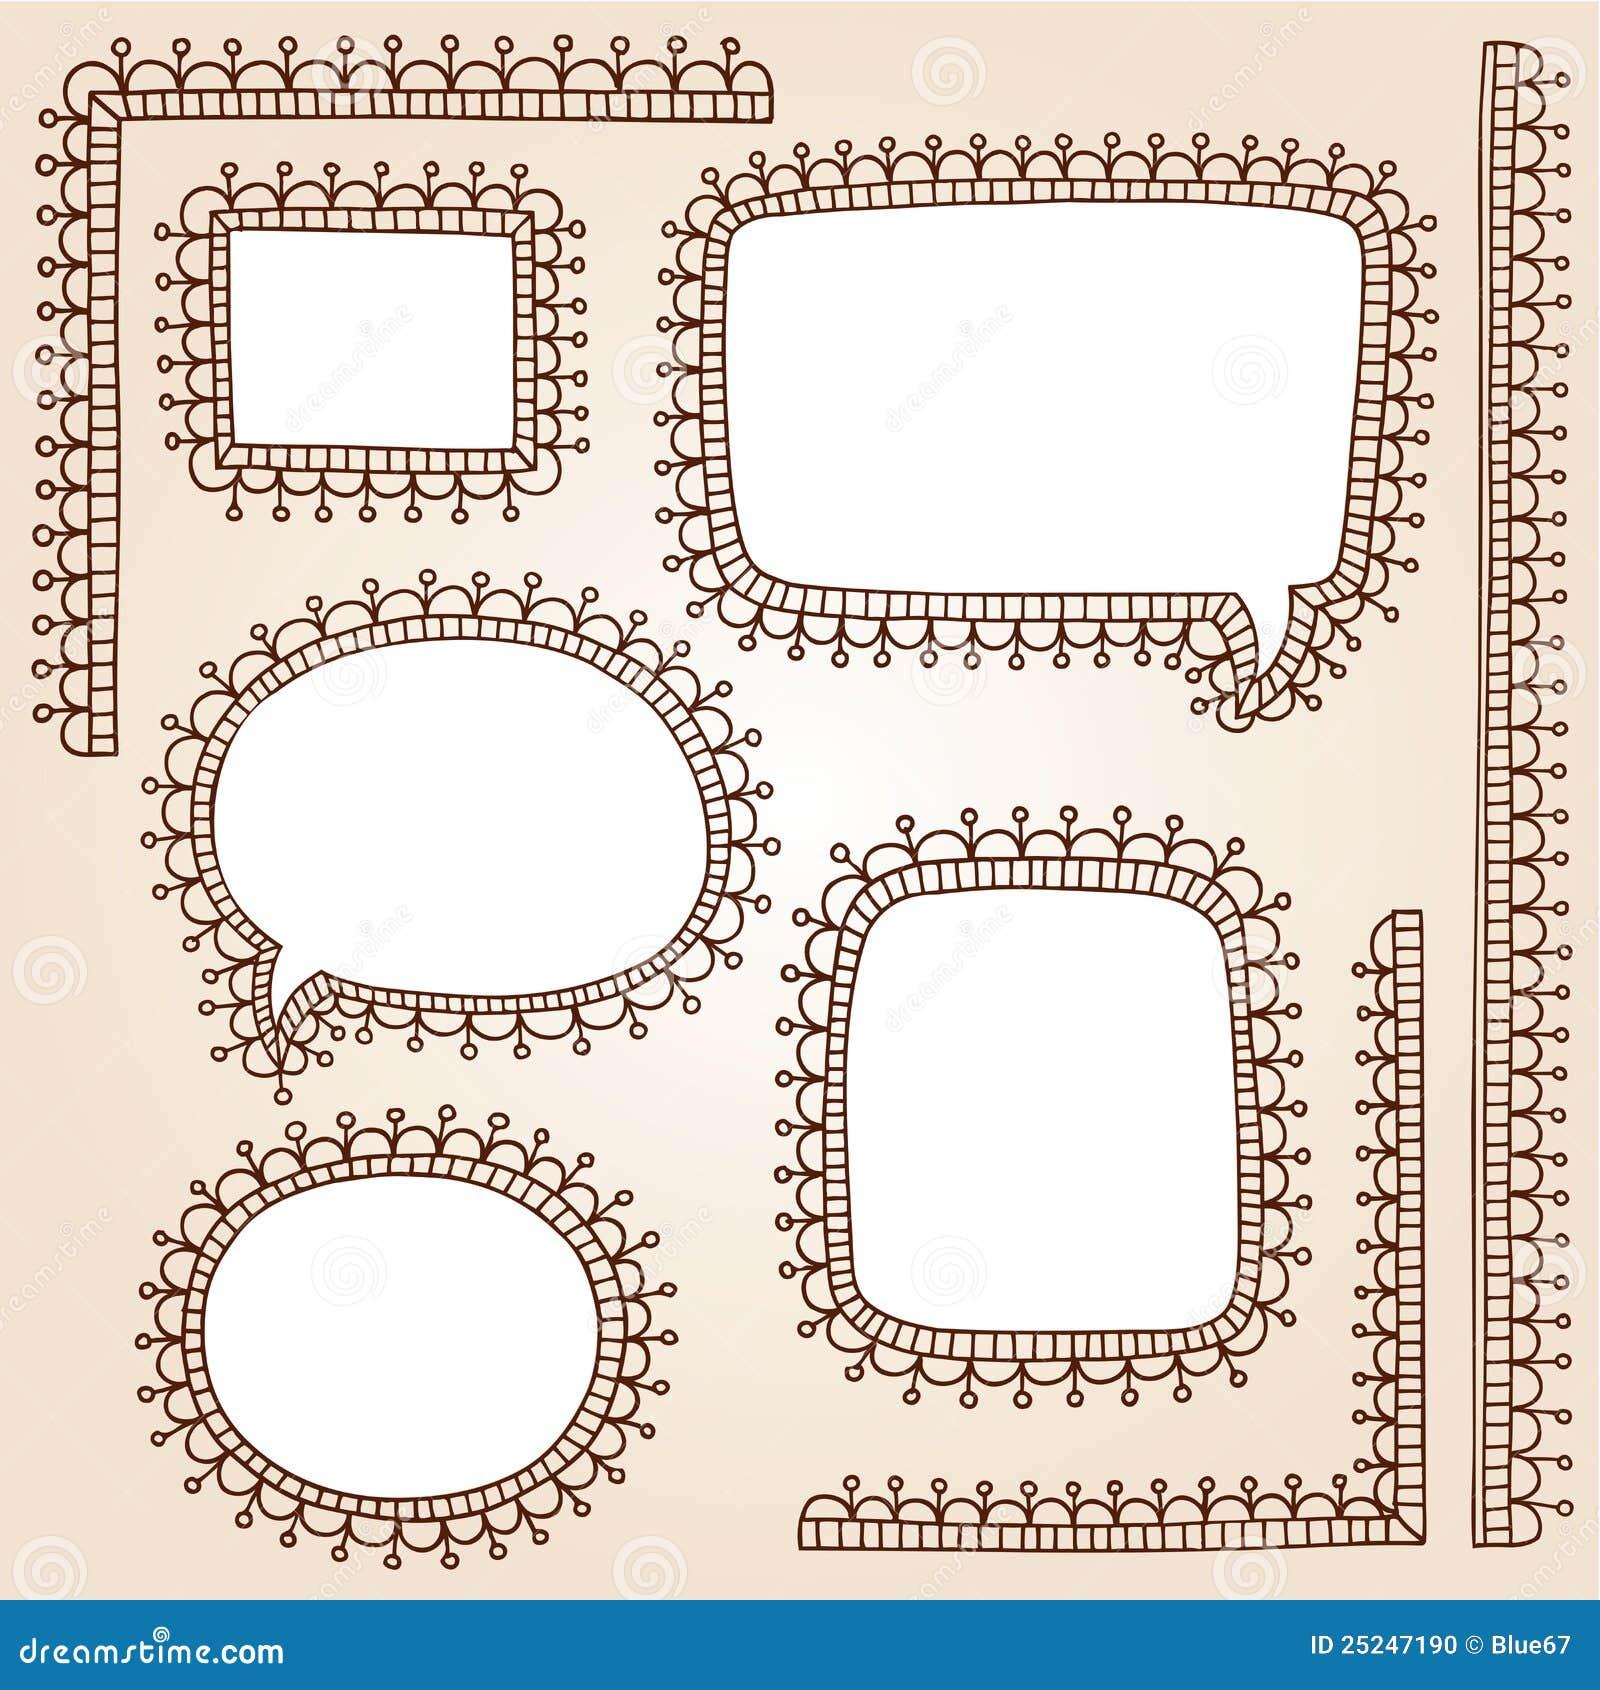 Henna διάνυσμα δερματοστιξιών Doodles Mehndi πλαισίων